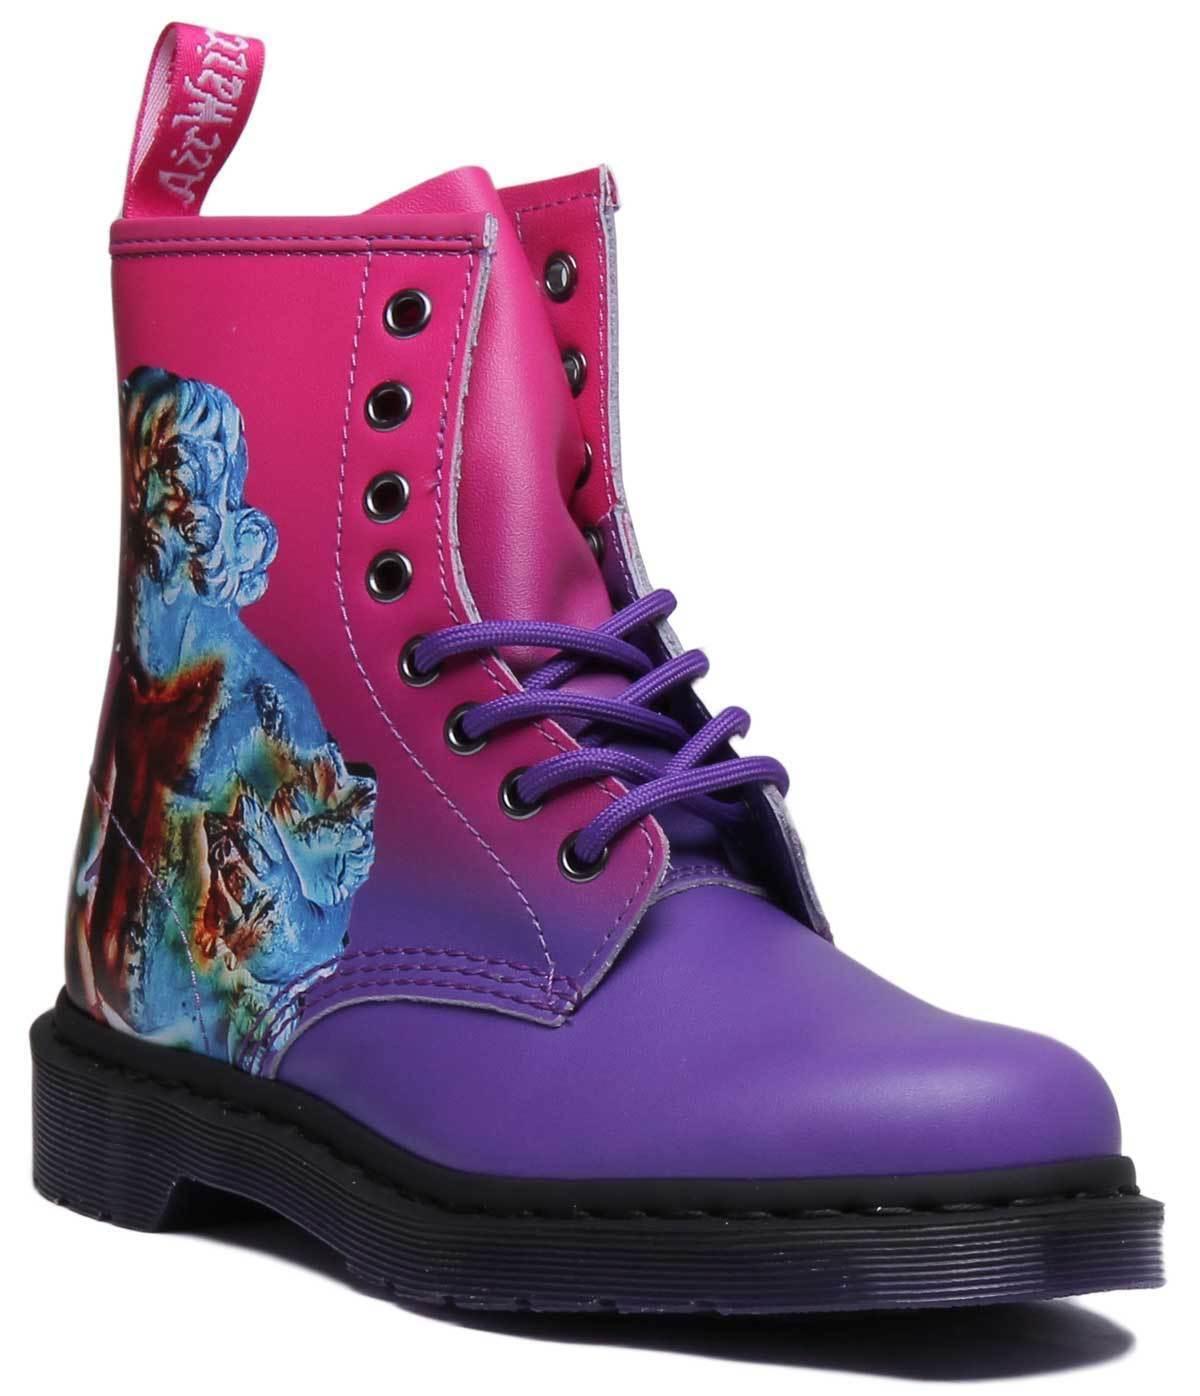 Dr Martens 1460 técnica técnica 1460 de cuero para mujer rosadodo púrpura botas al Tobillo tamaño de Reino Unido 3 - 8 8a87b9